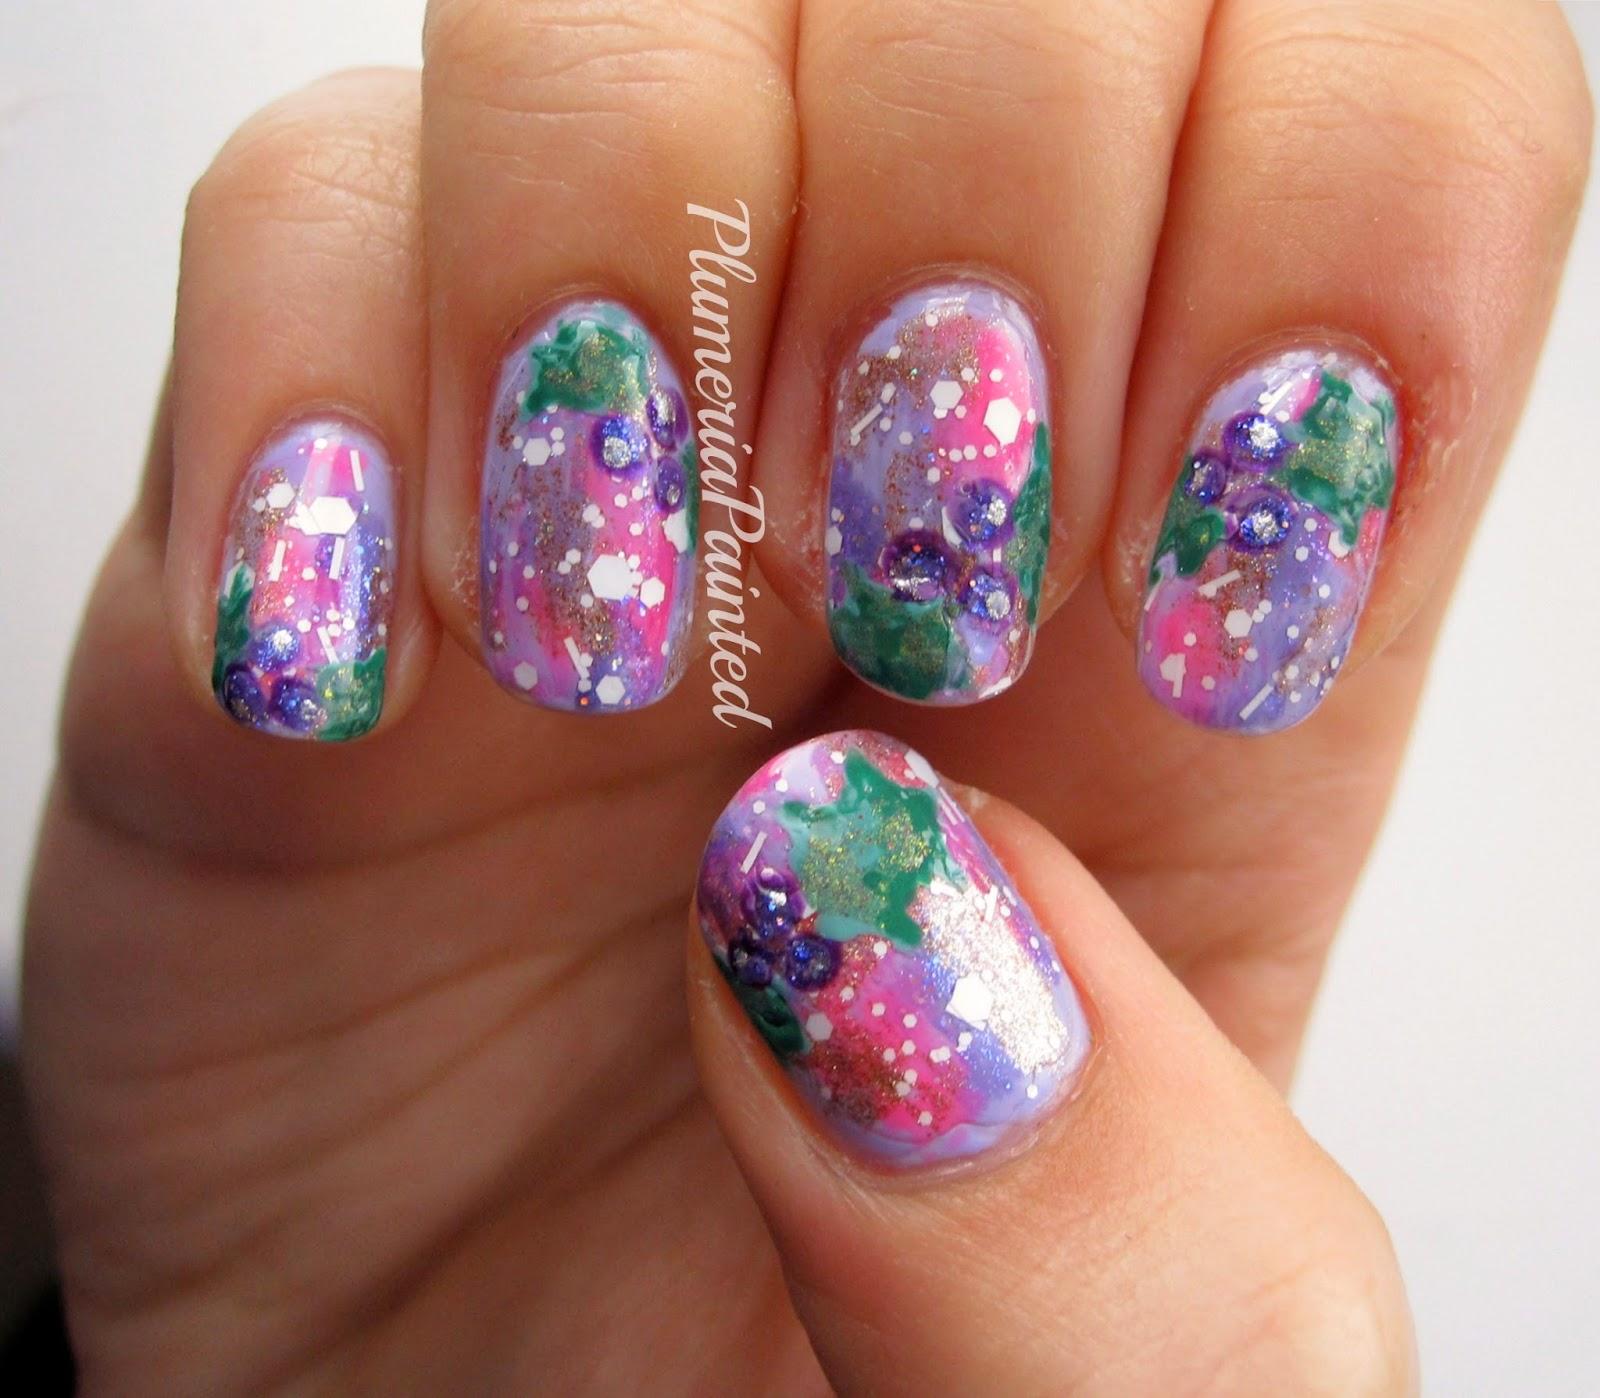 Plumeriapainted Winter Holly Feminine Distressed Nails